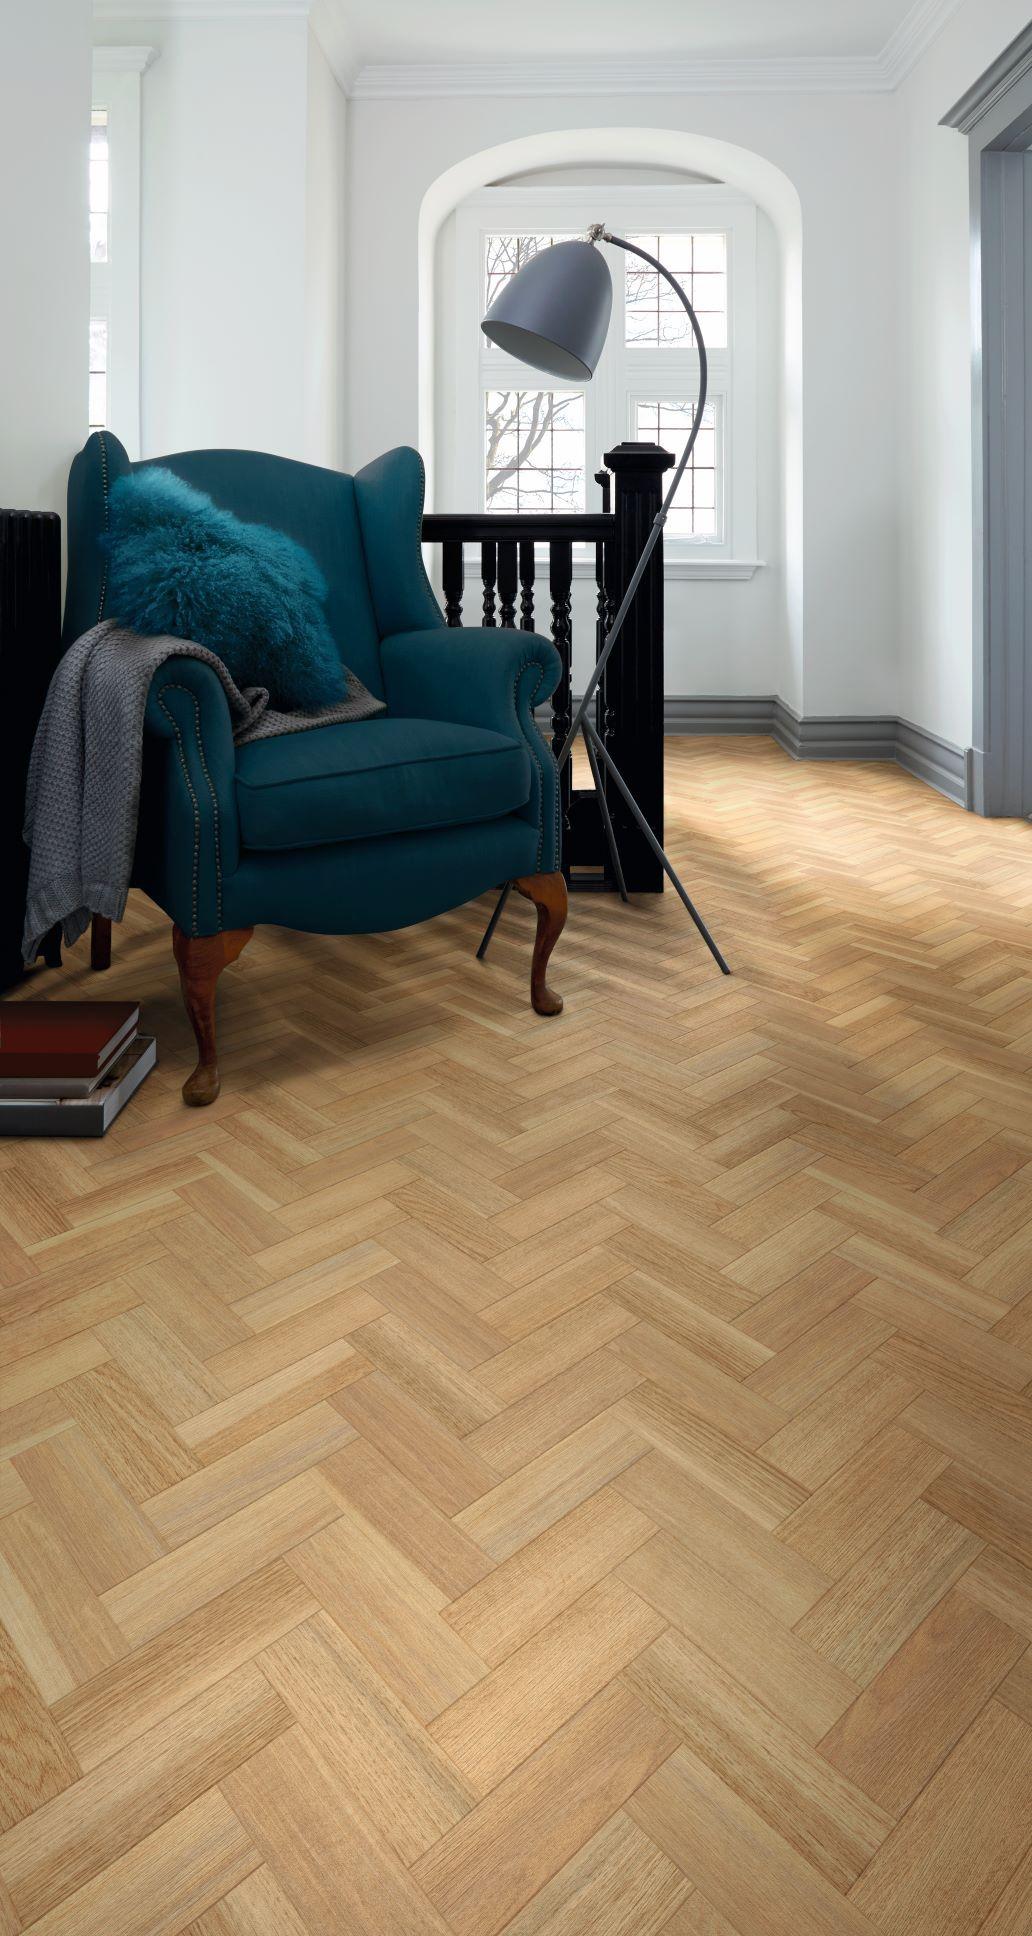 TLC Massimo Invent Blushed Oak Parquet 5331 Design